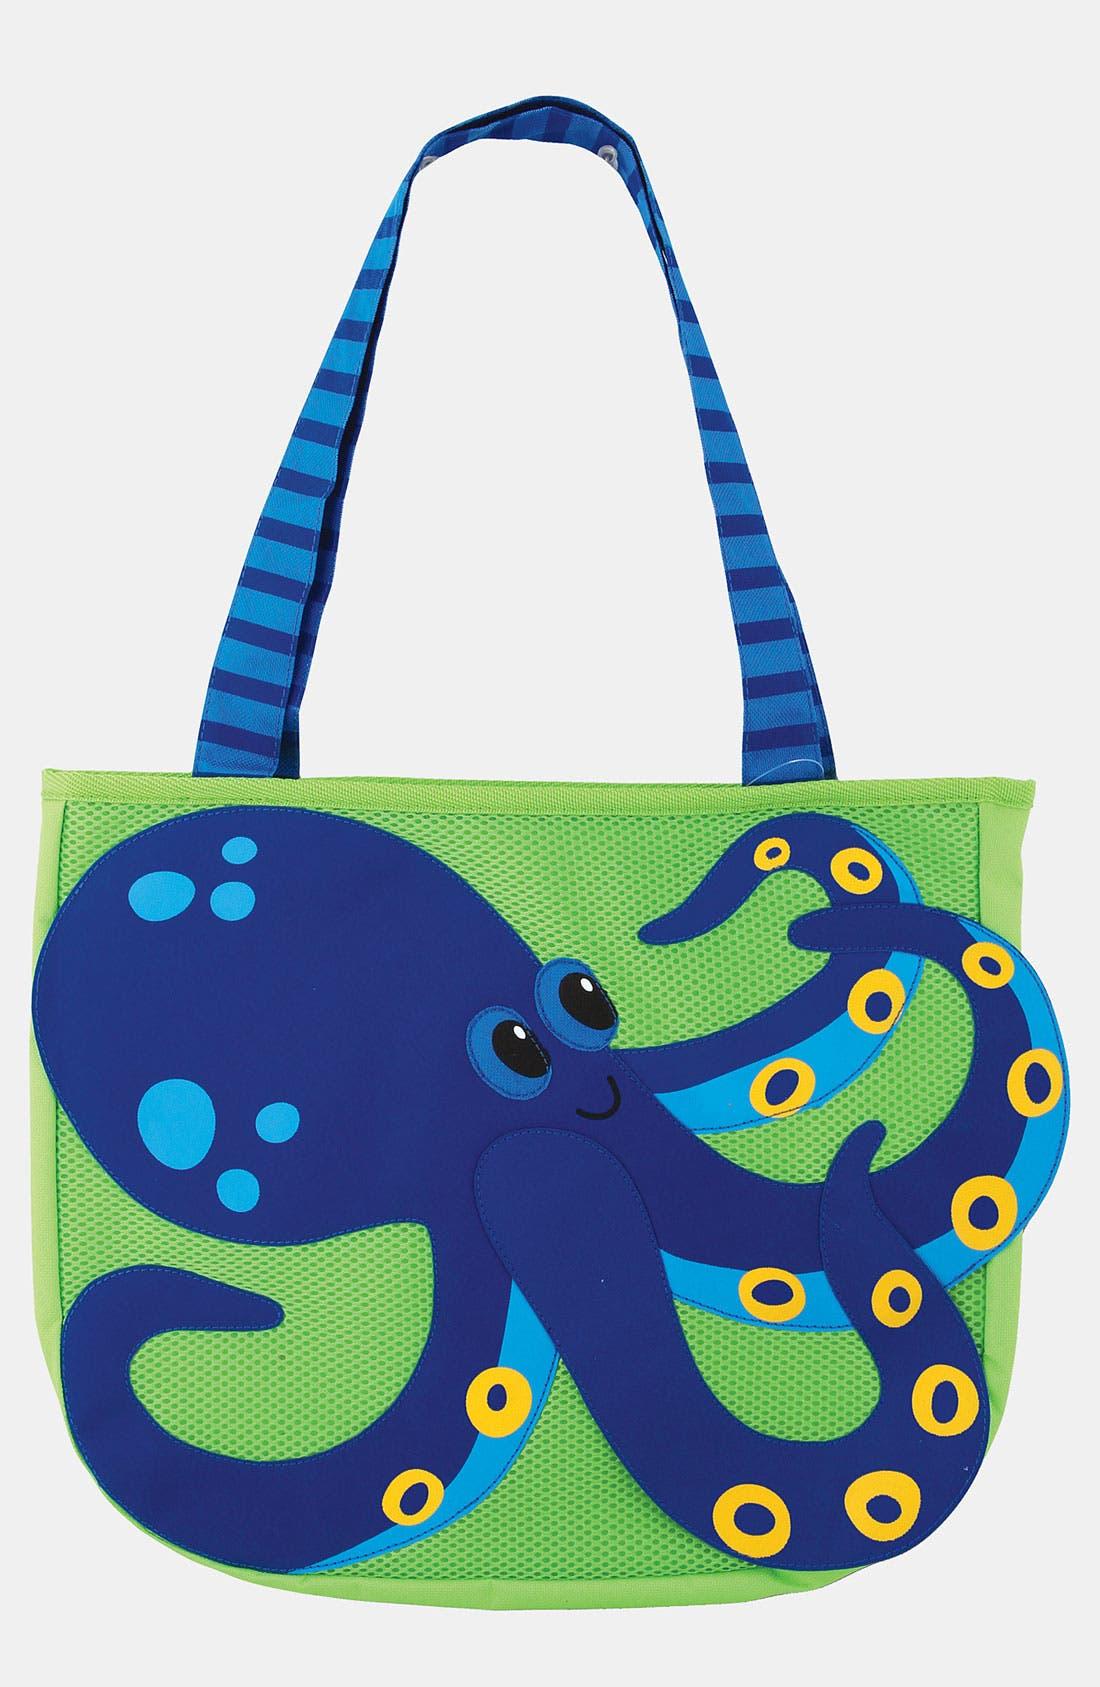 Main Image - Stephen Joseph 'Octopus' Beach Tote & Toys